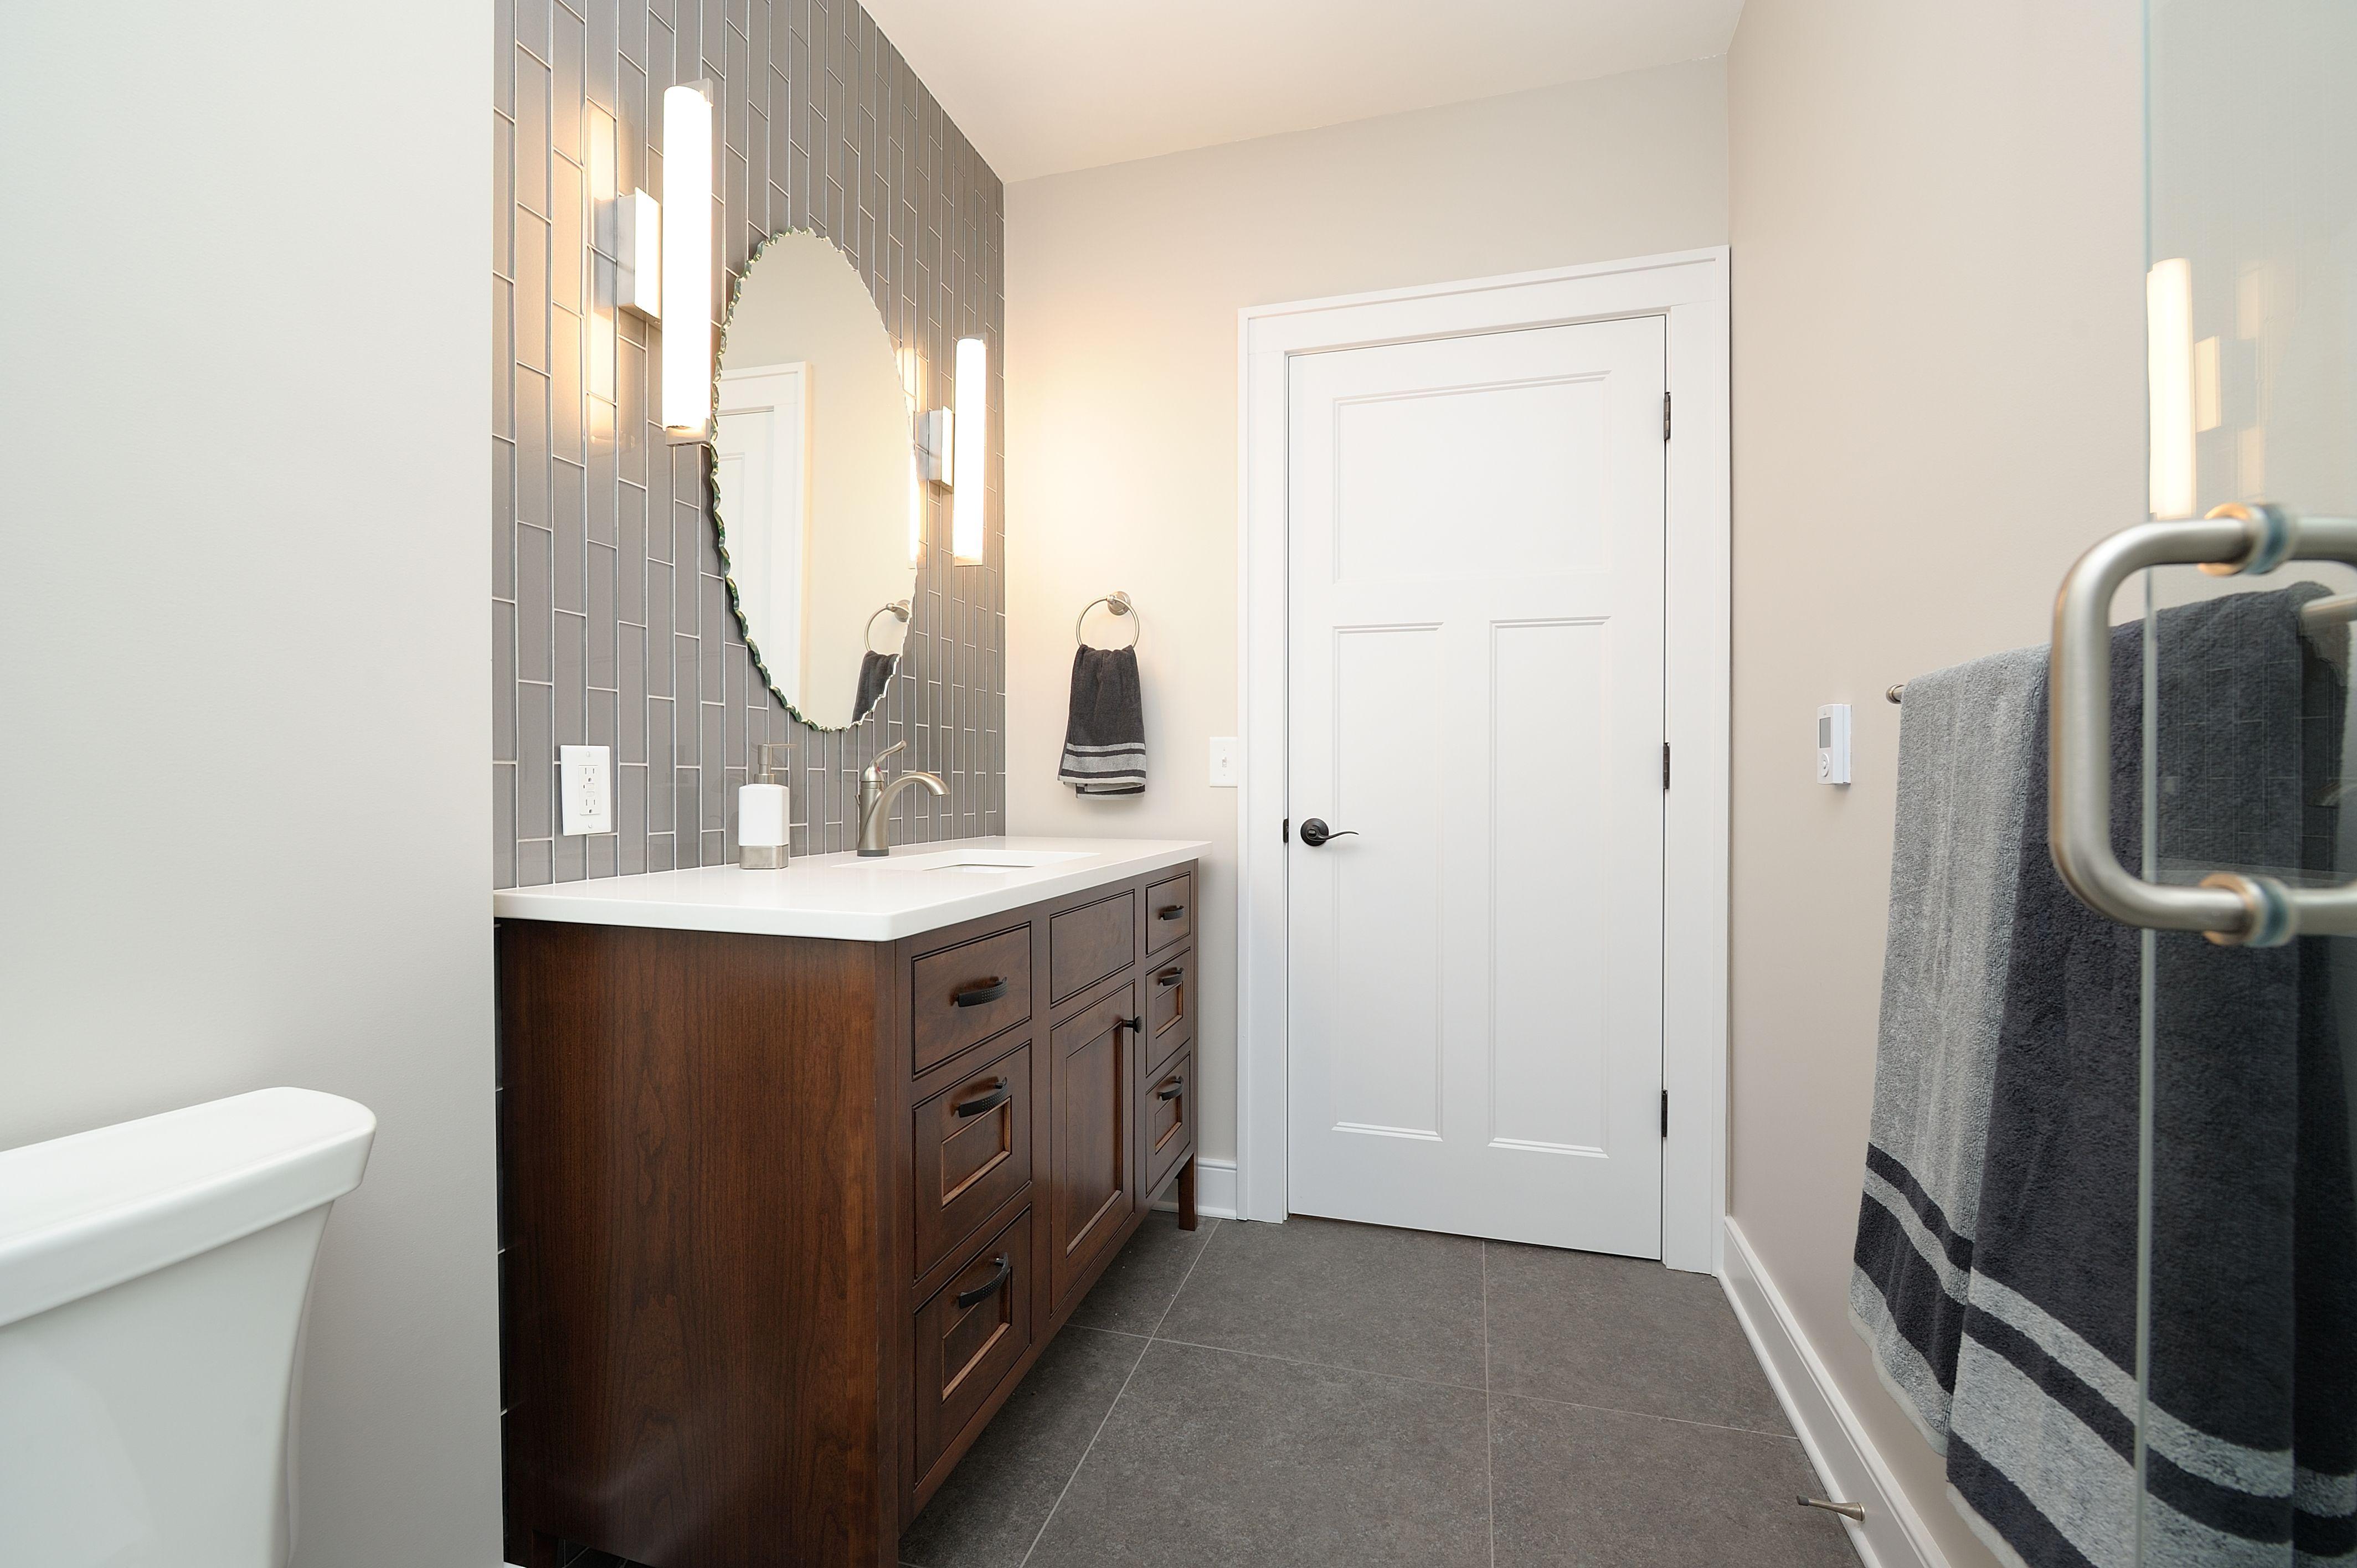 Exceptional Bathroom Remodel By DeHaan Remodeling Specialists Kalamazoo MI